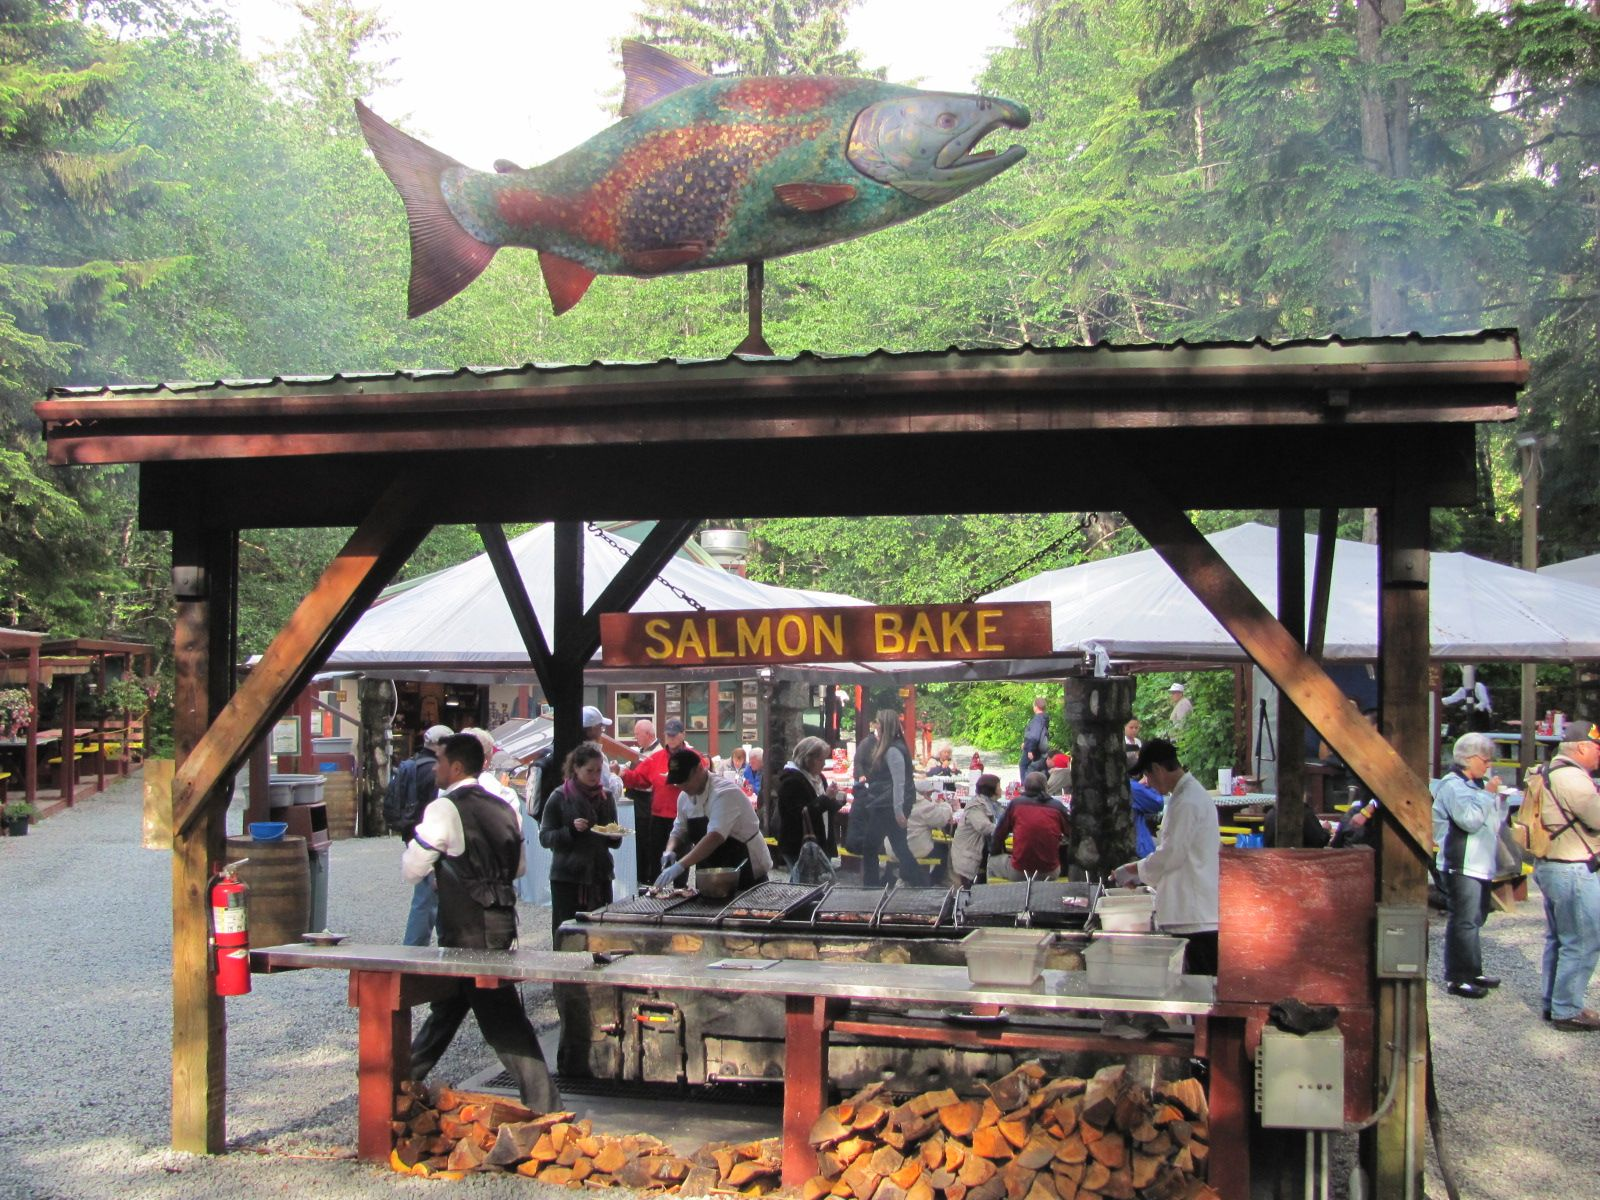 Alaskan Salmon Bake Immerse Yourself In An Allinclusive Alaskan - All inclusive alaska